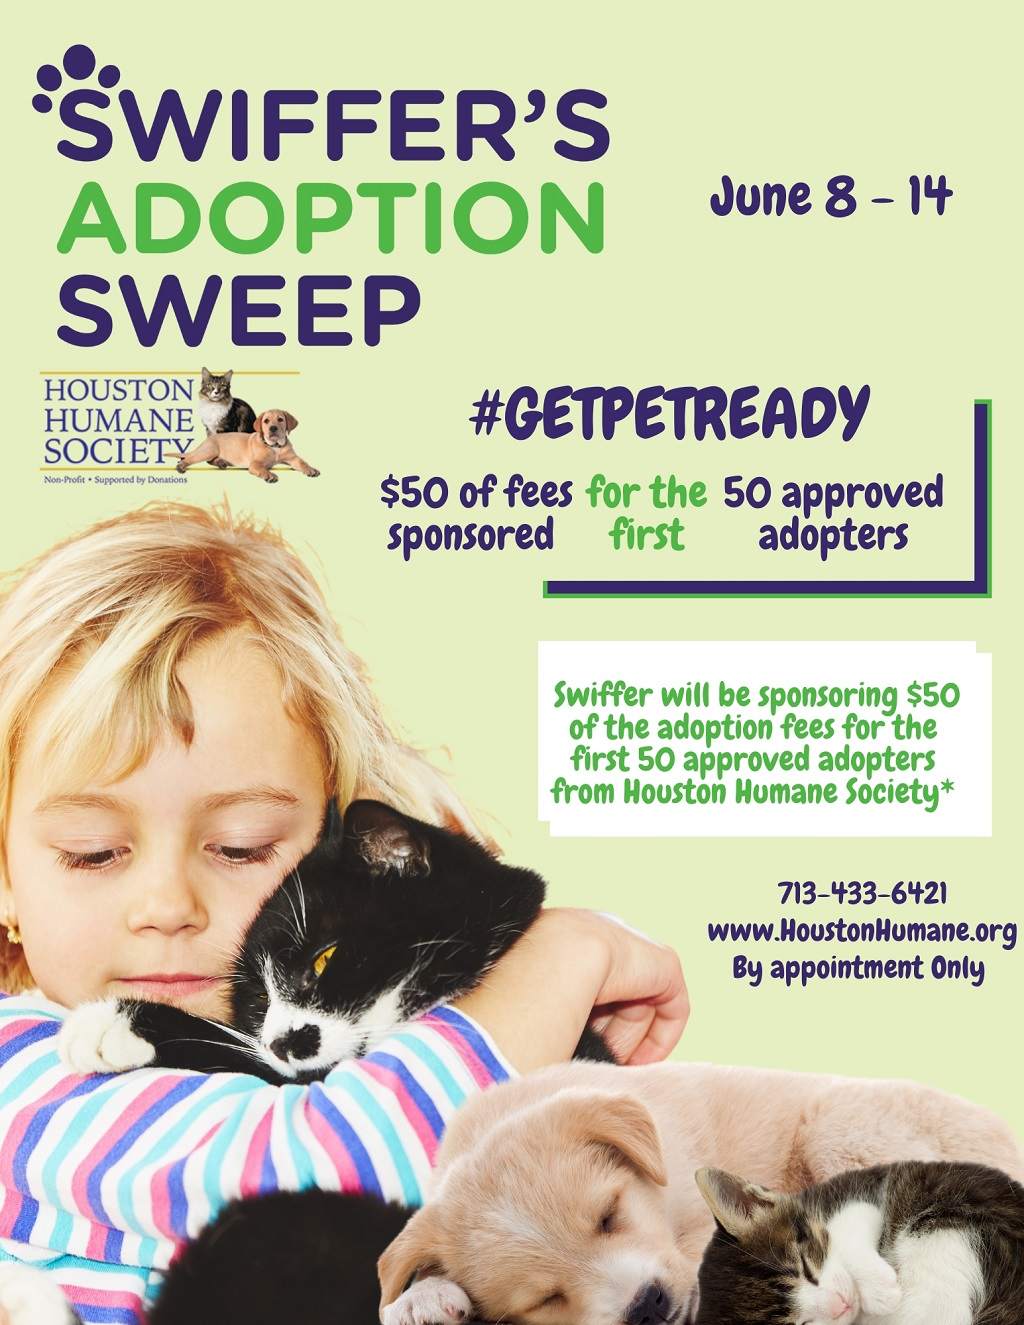 Swiffer Adoption Sweep